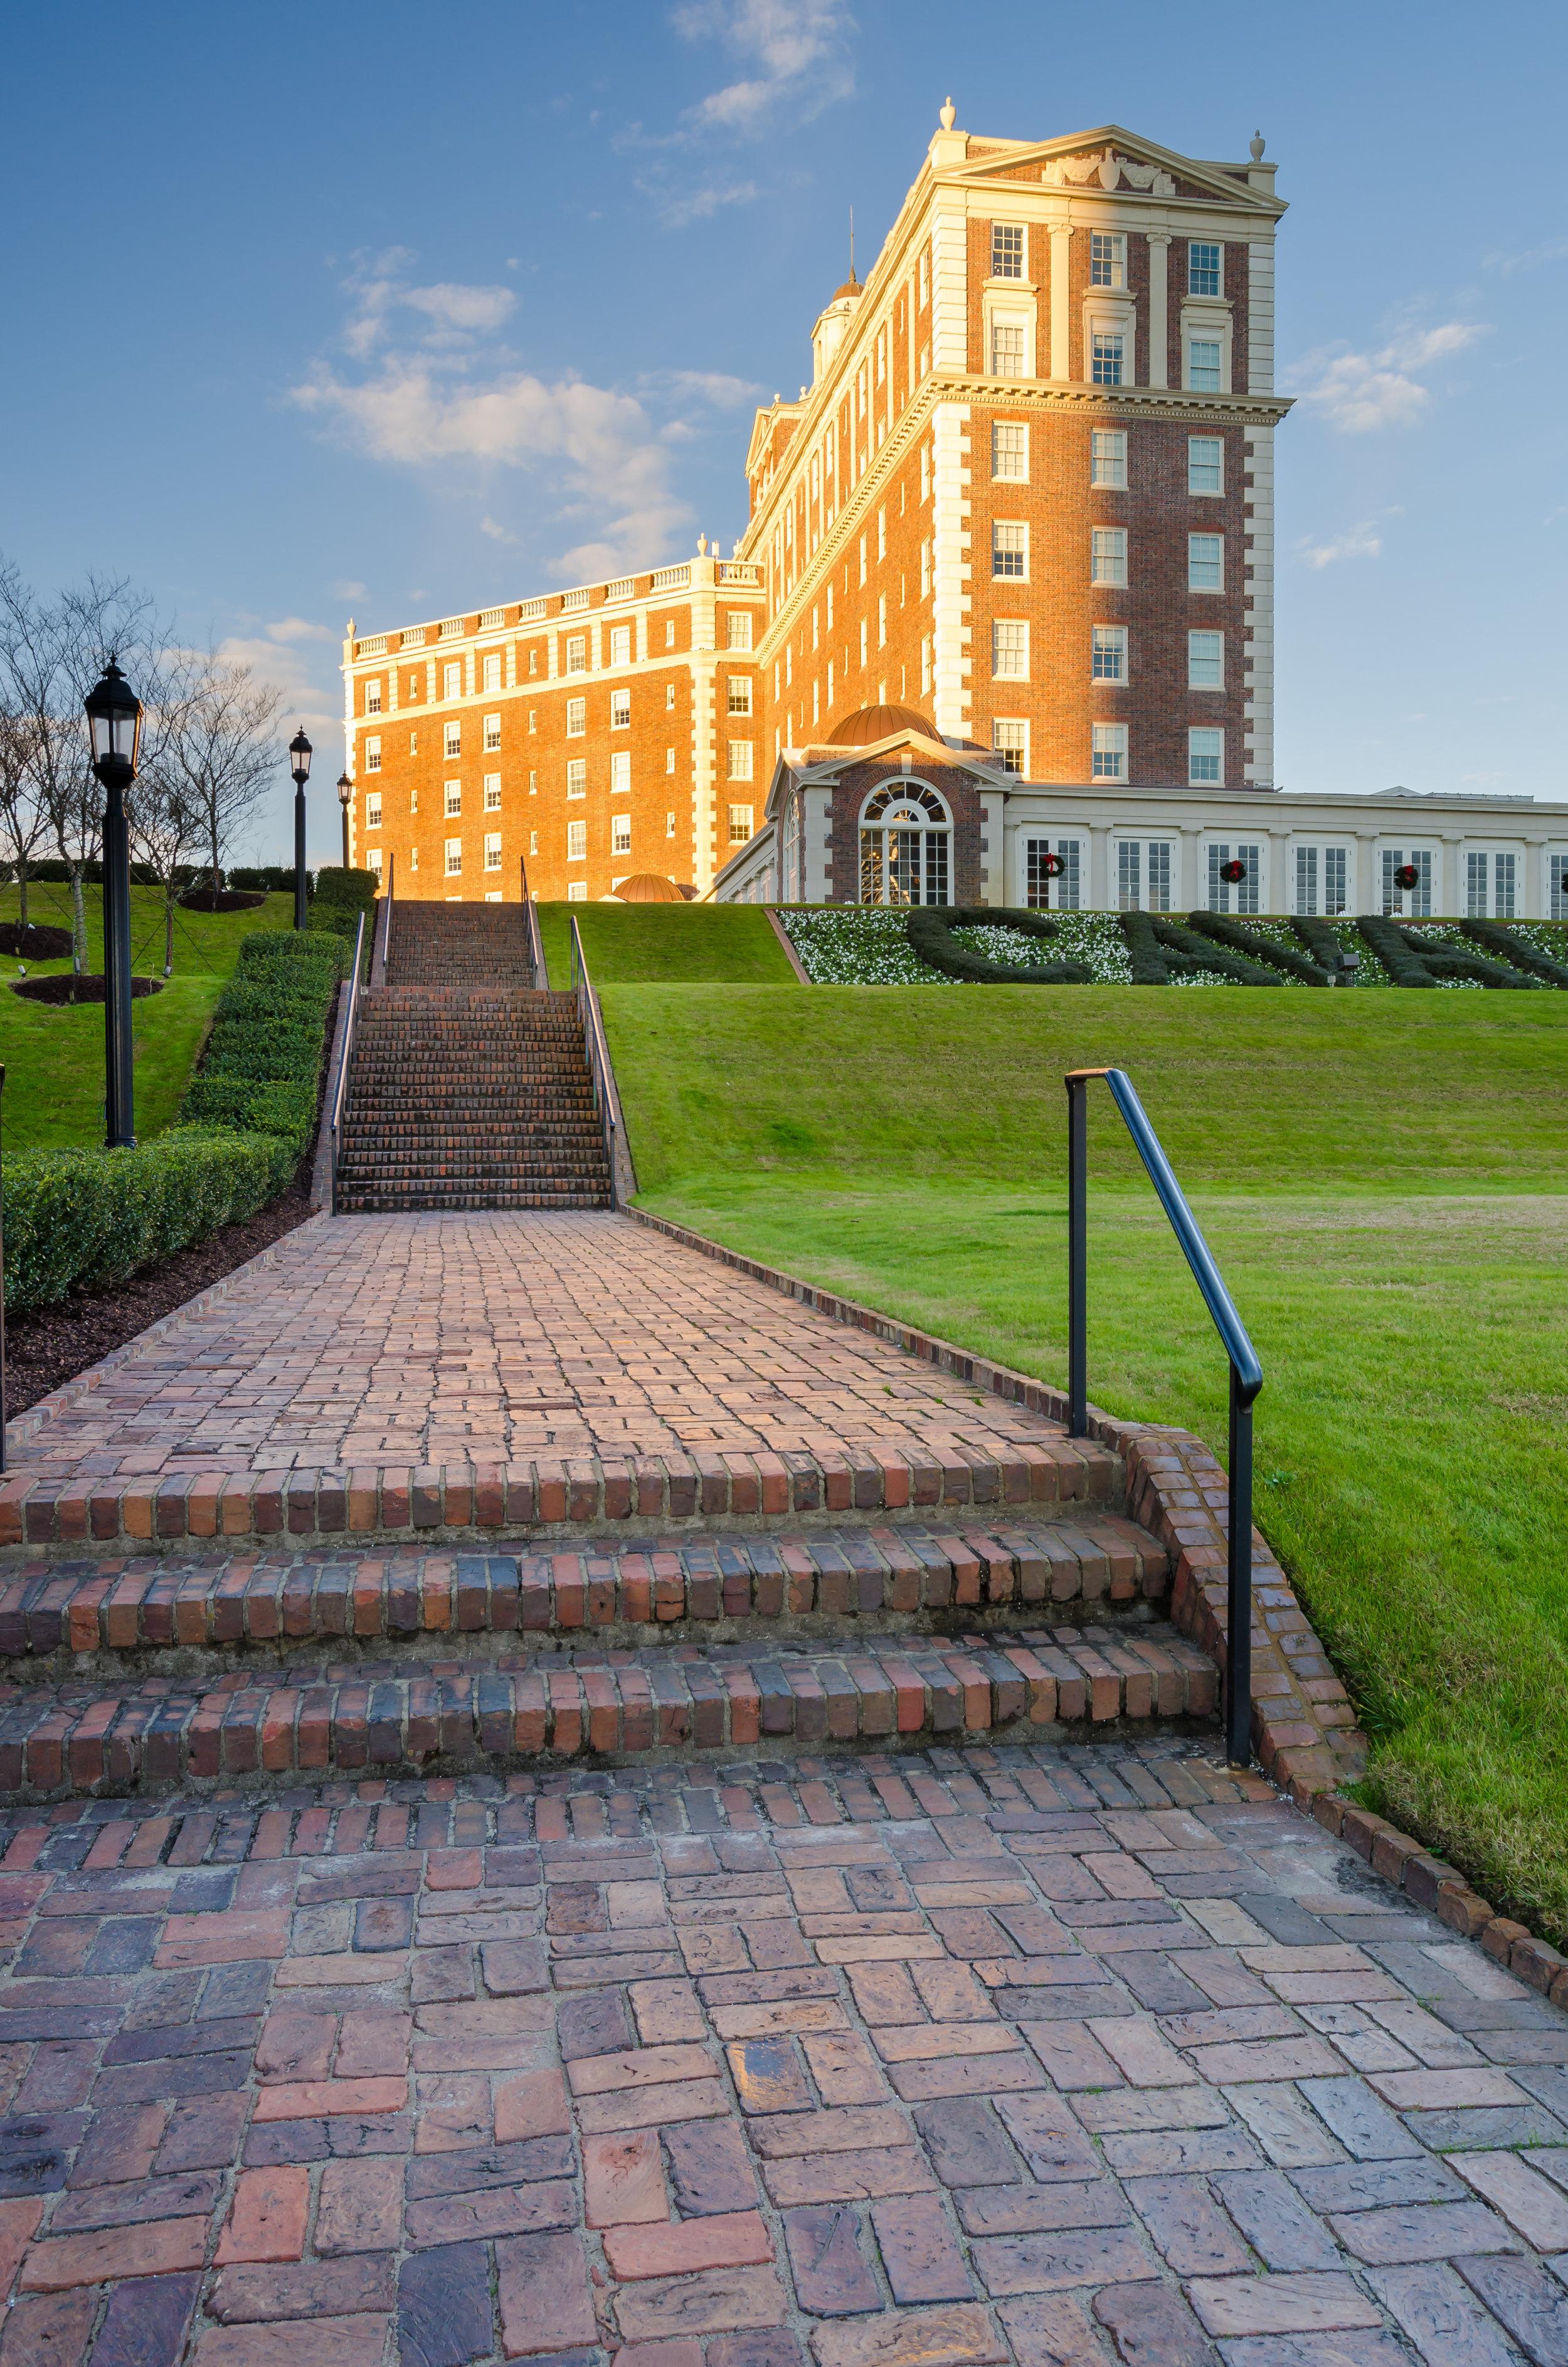 Cavalier Hotel-Cavalier-hotel-Virginia Beach-Virginia-historic.jpg